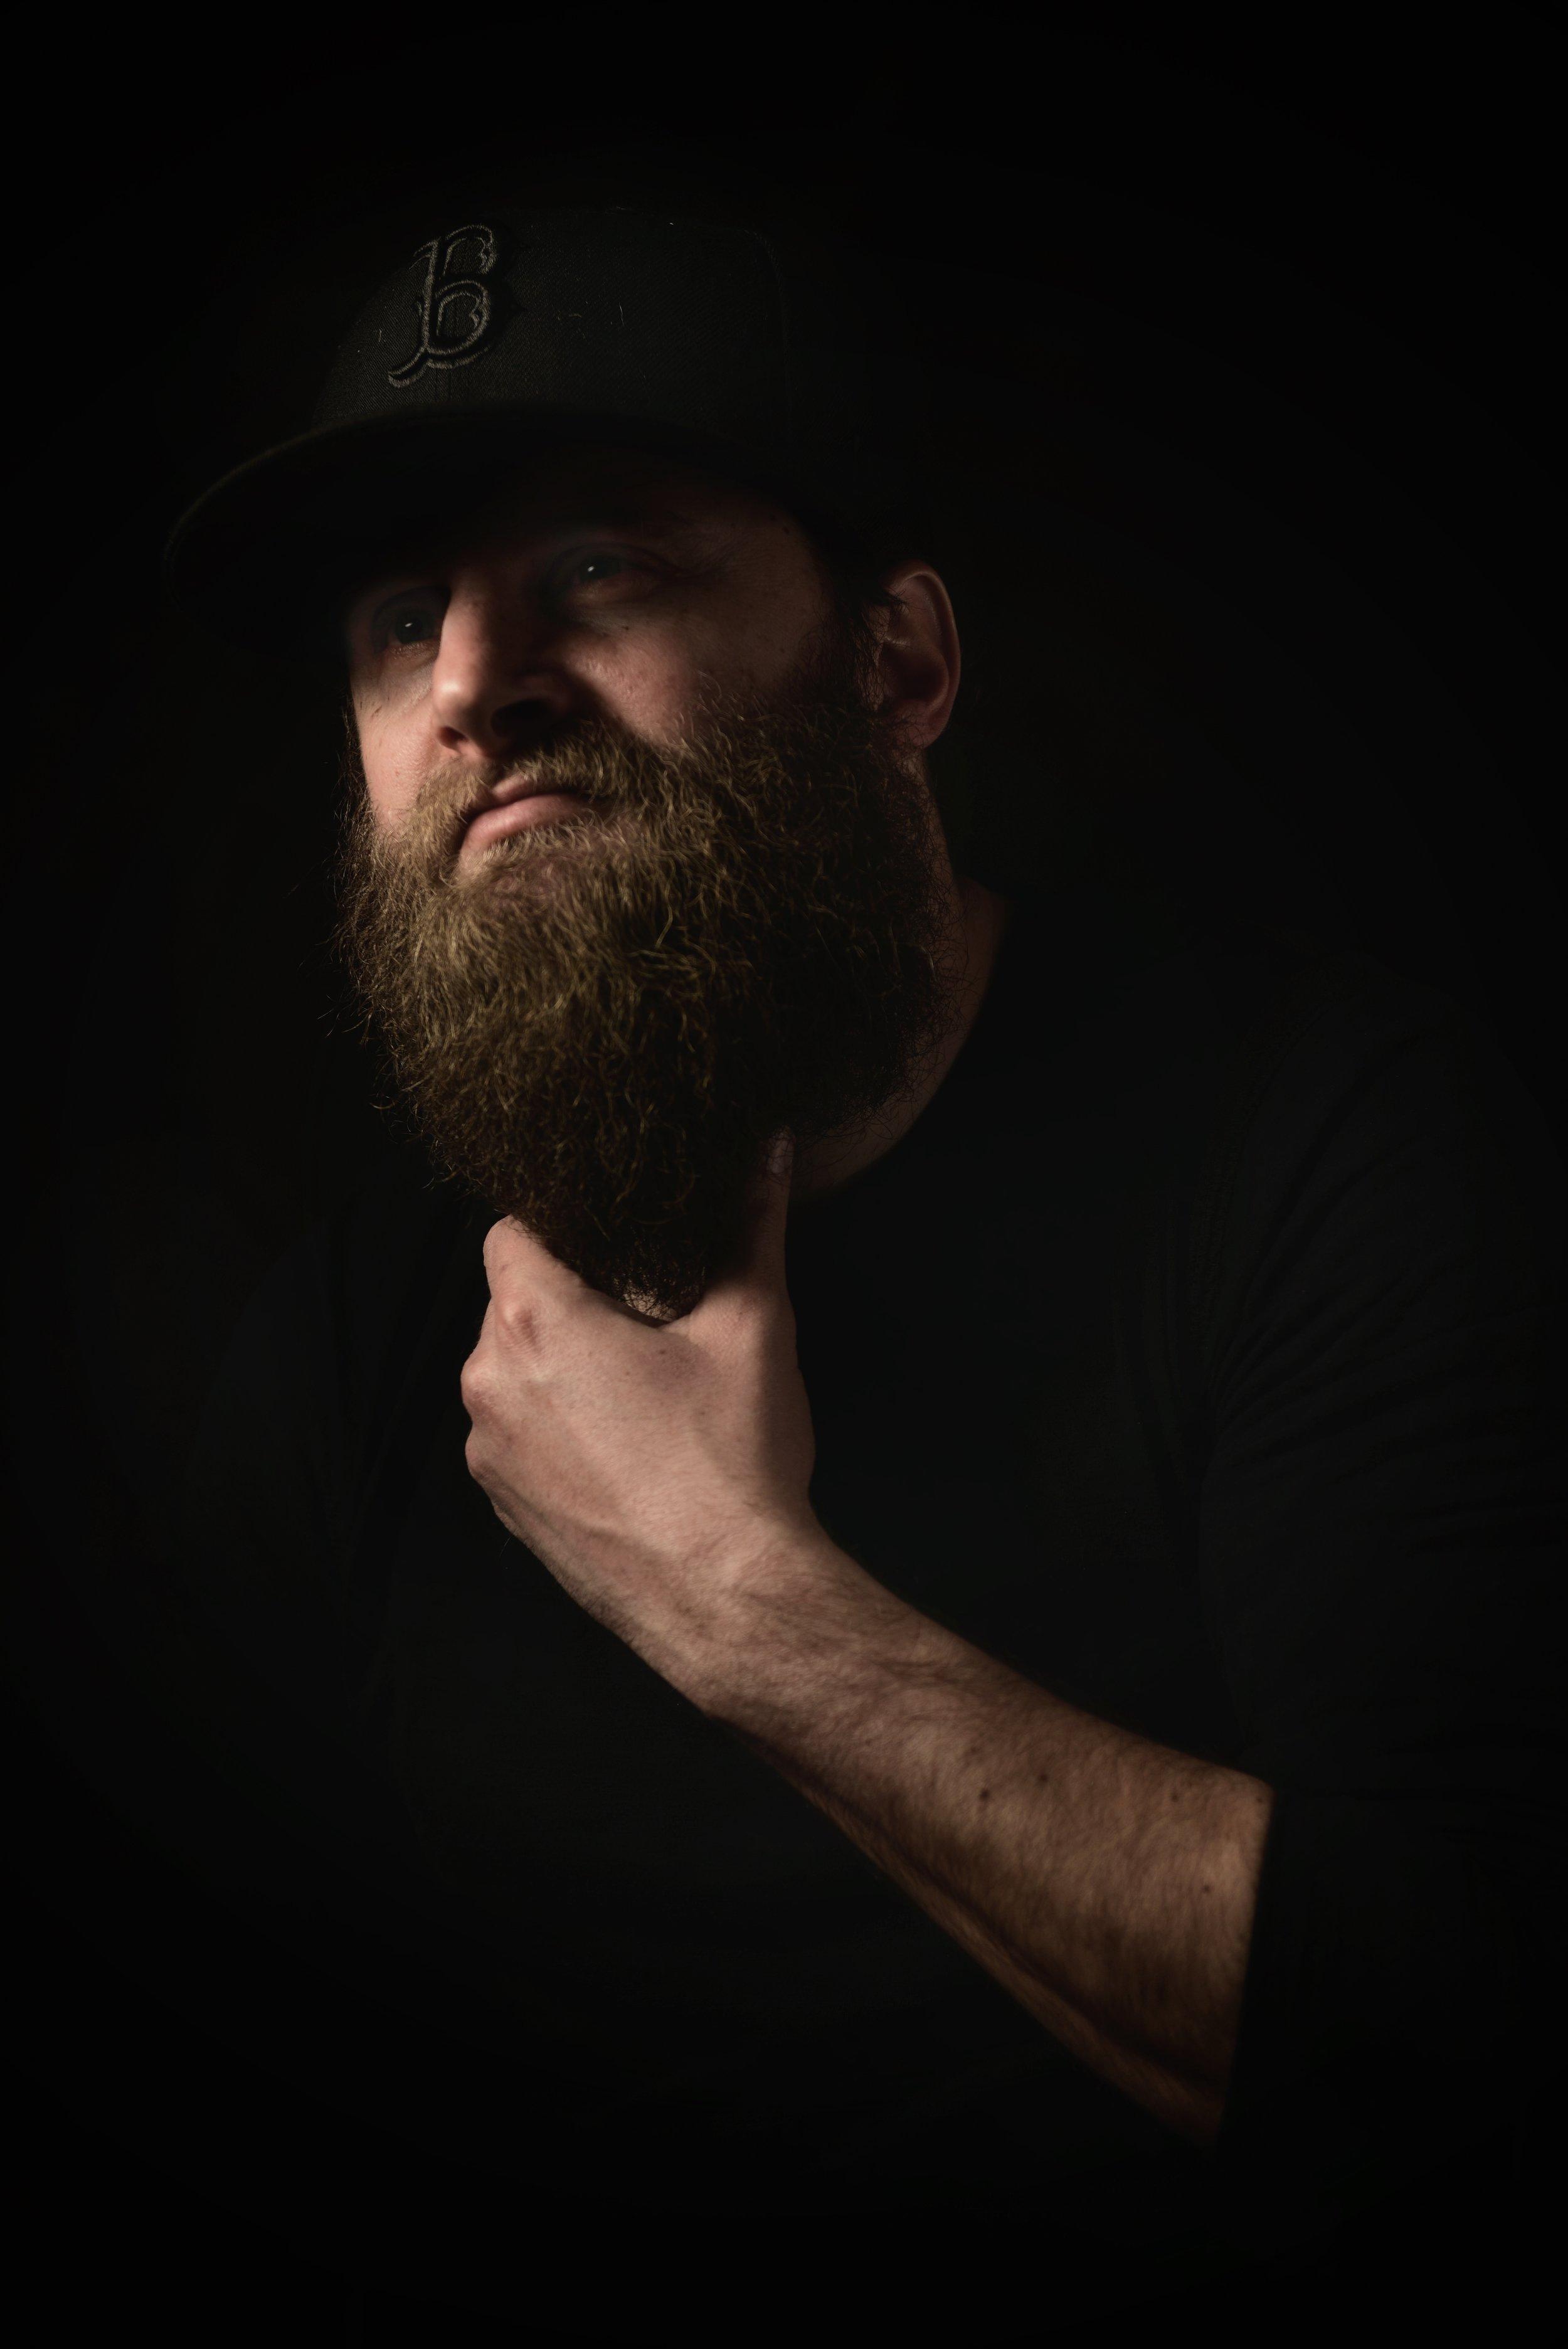 Drummer Jonathan Ulman